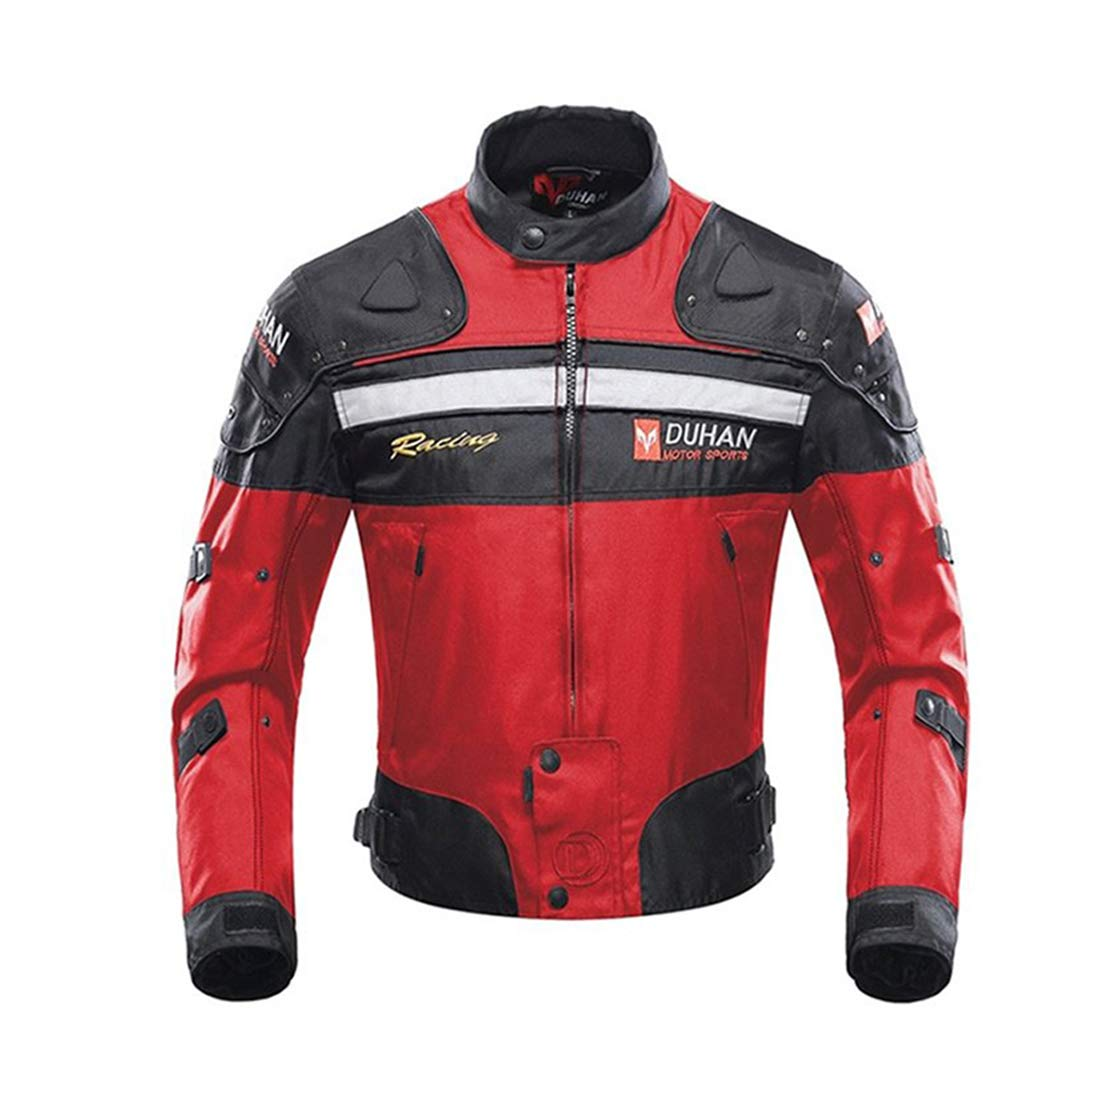 Motorcycle Motorbike Windproof Protective Clothing